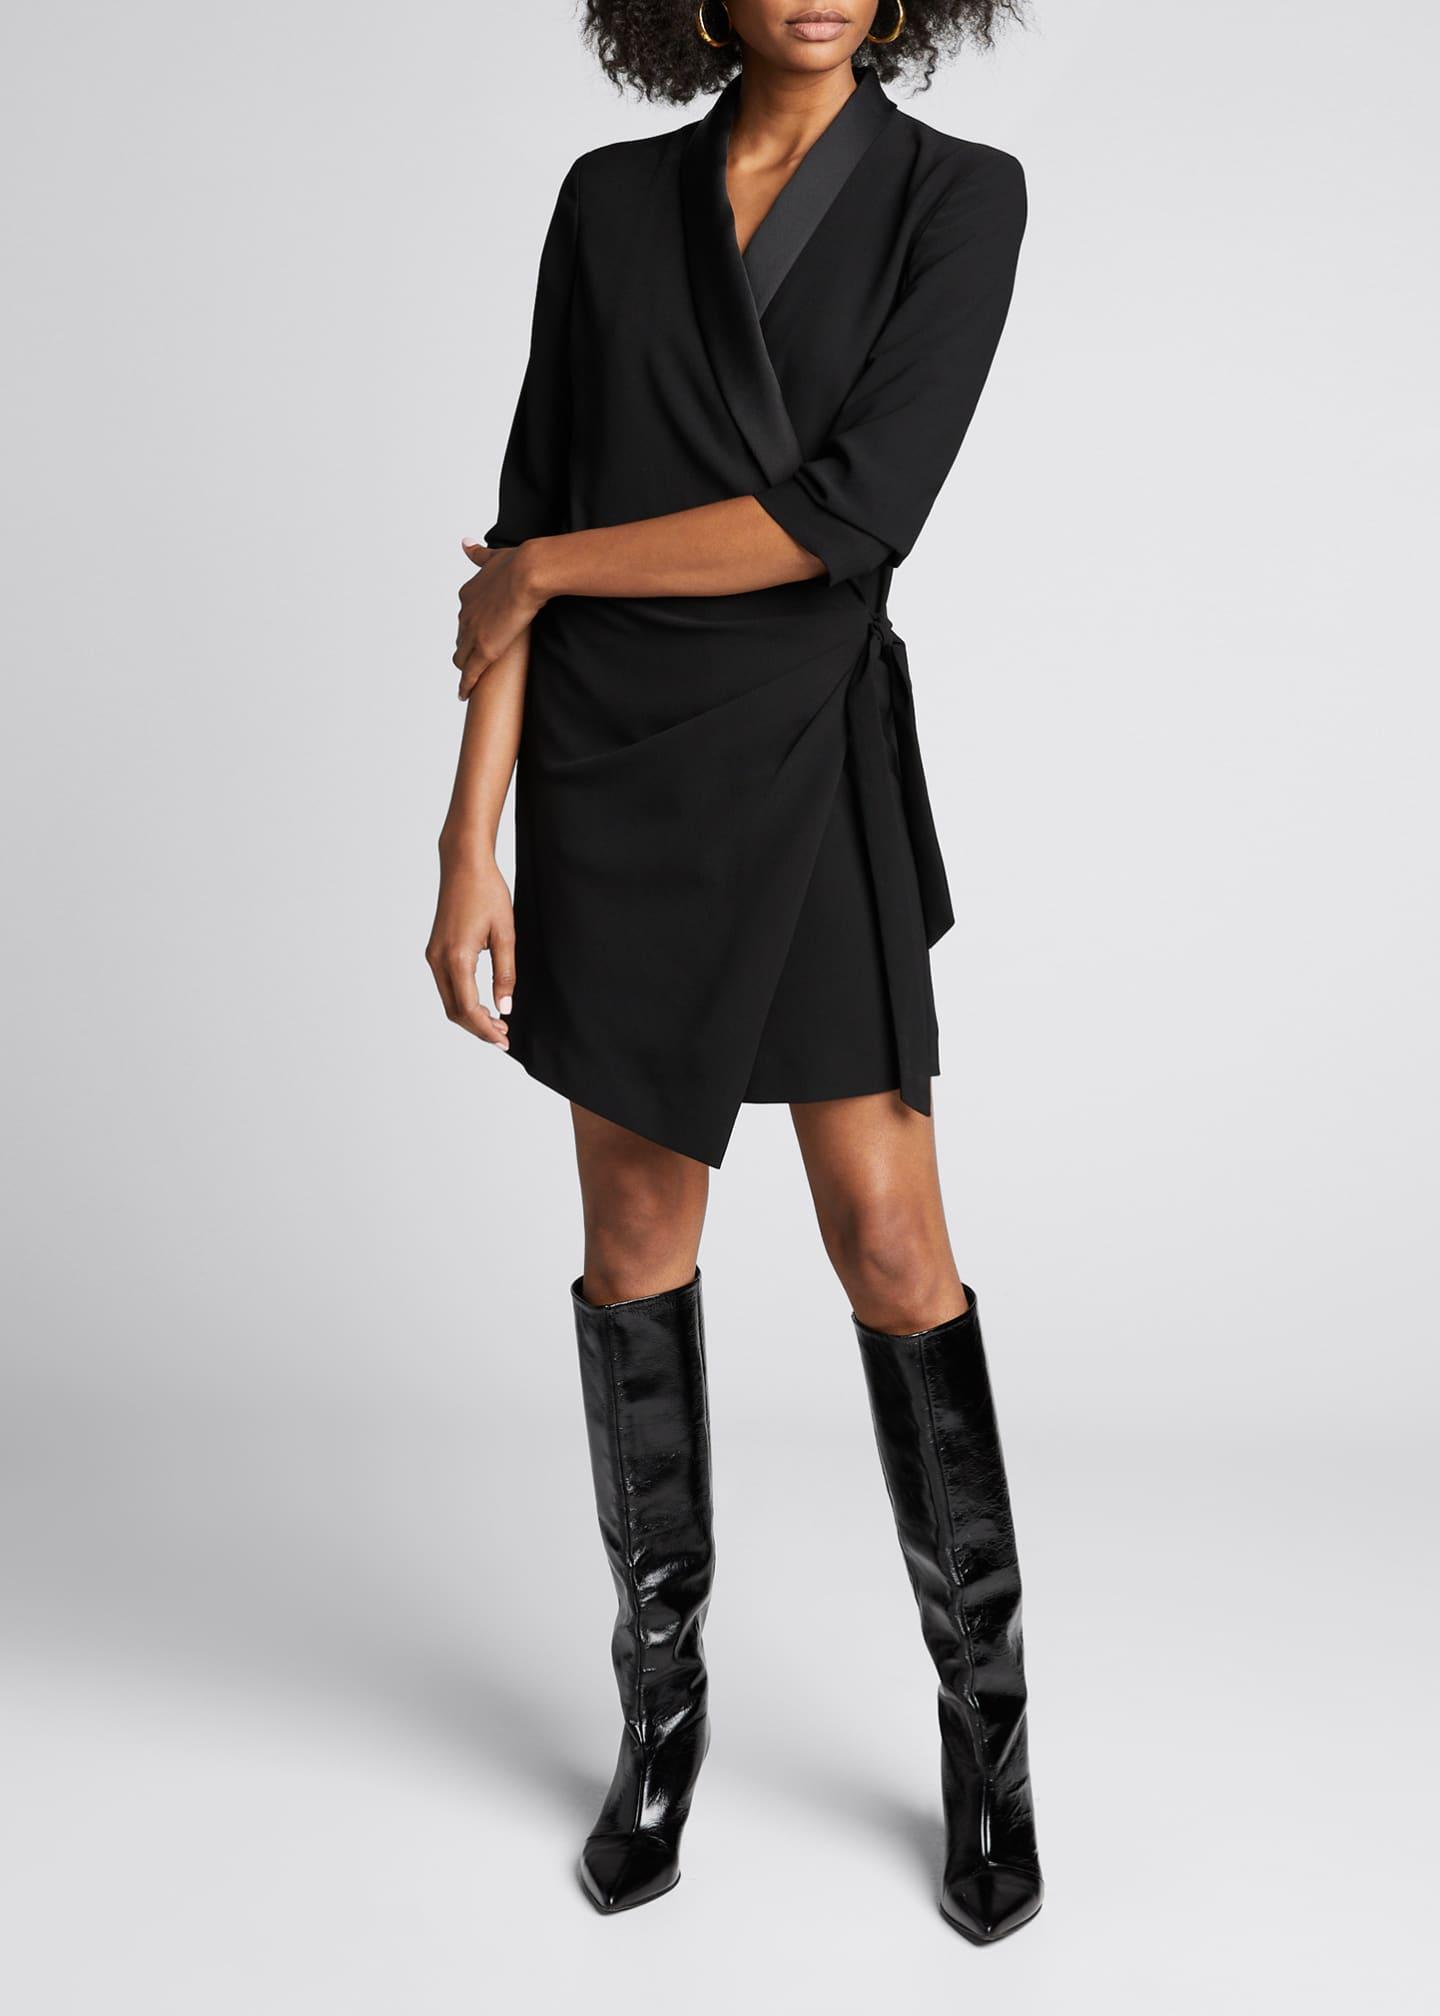 FRAME Tuxedo 3/4-Sleeve Wrap Dress